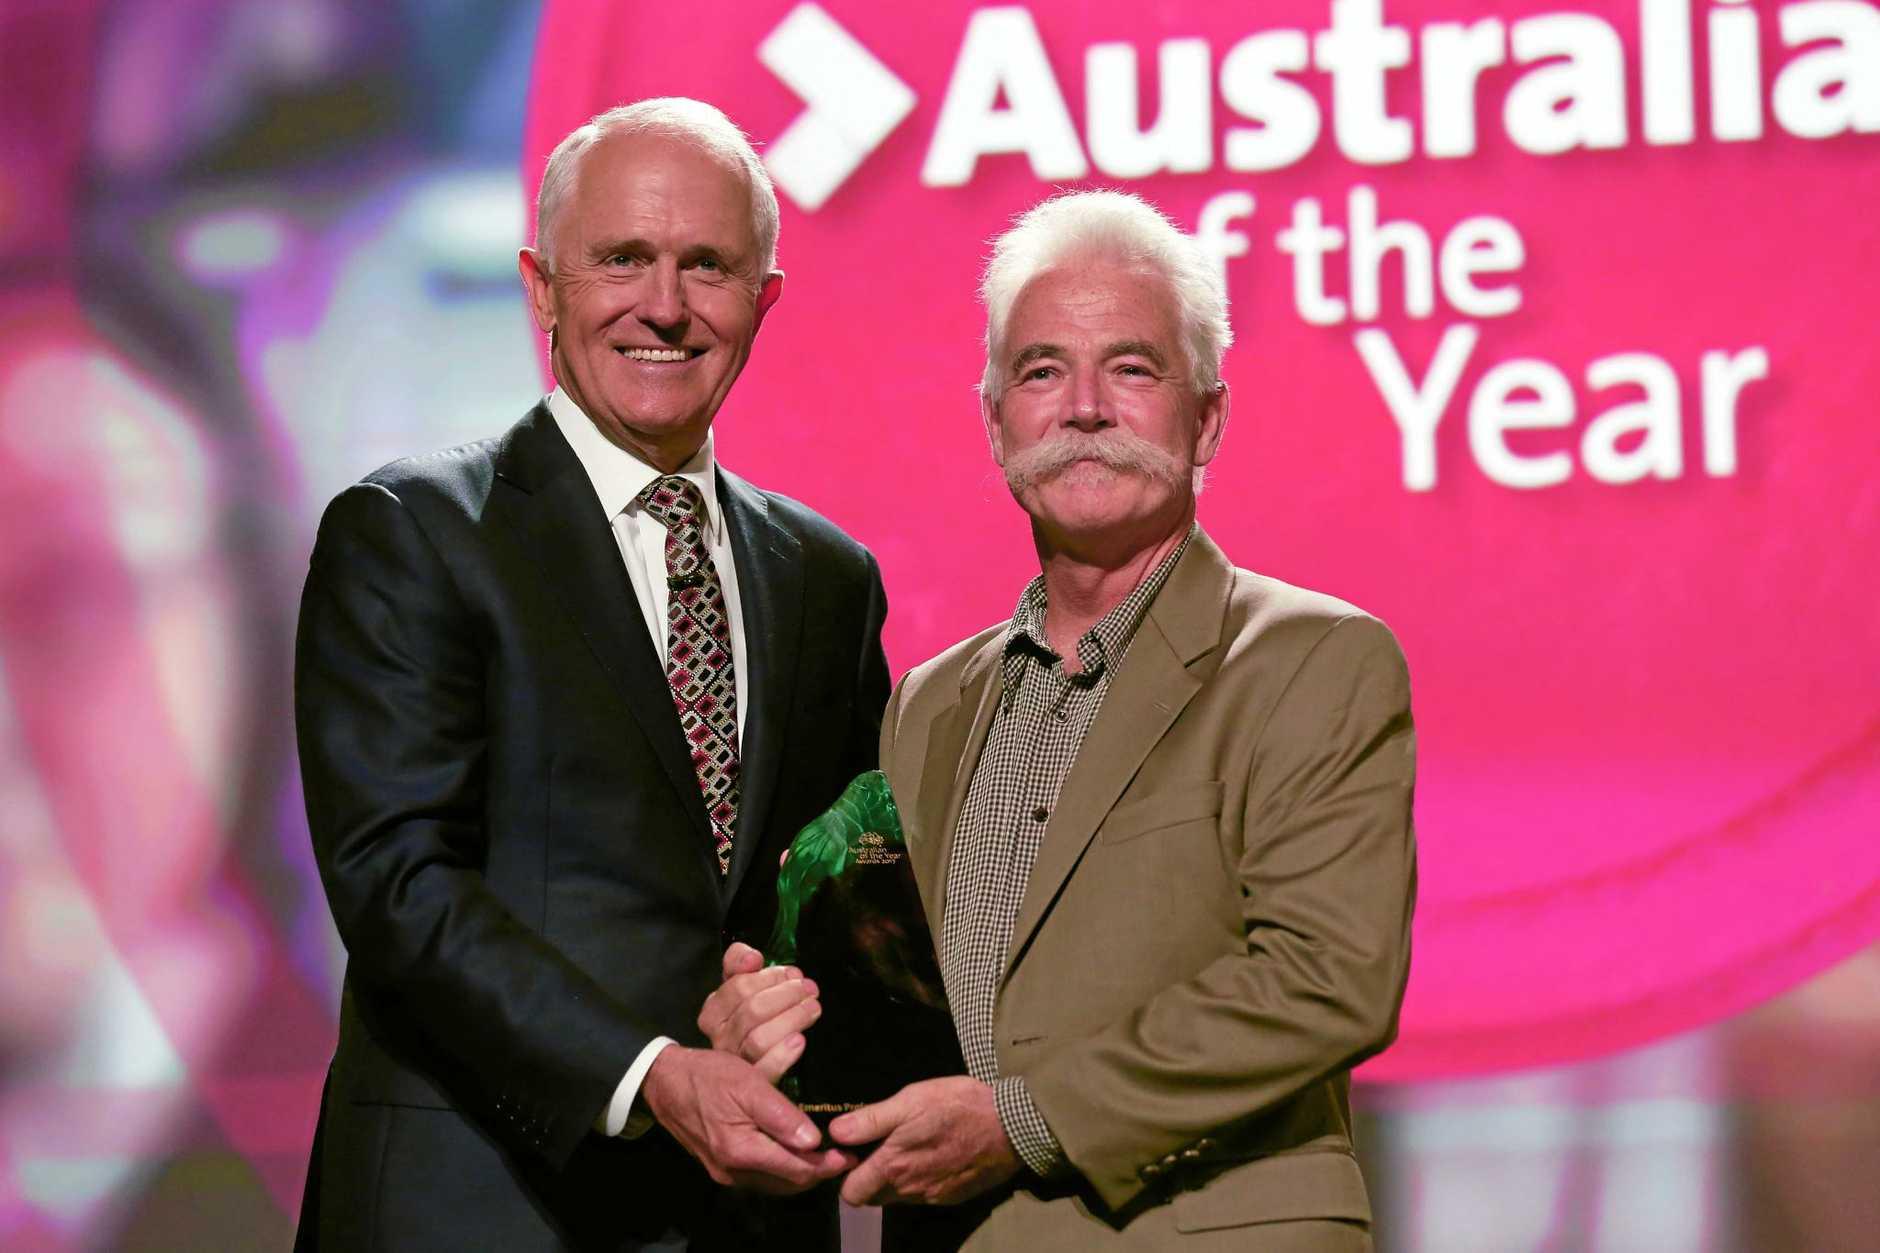 SURPRISE WIN: Prime Minister Malcolm Turnbull presents the Australian of the Year award to Professor Alan Mackay-Sim.